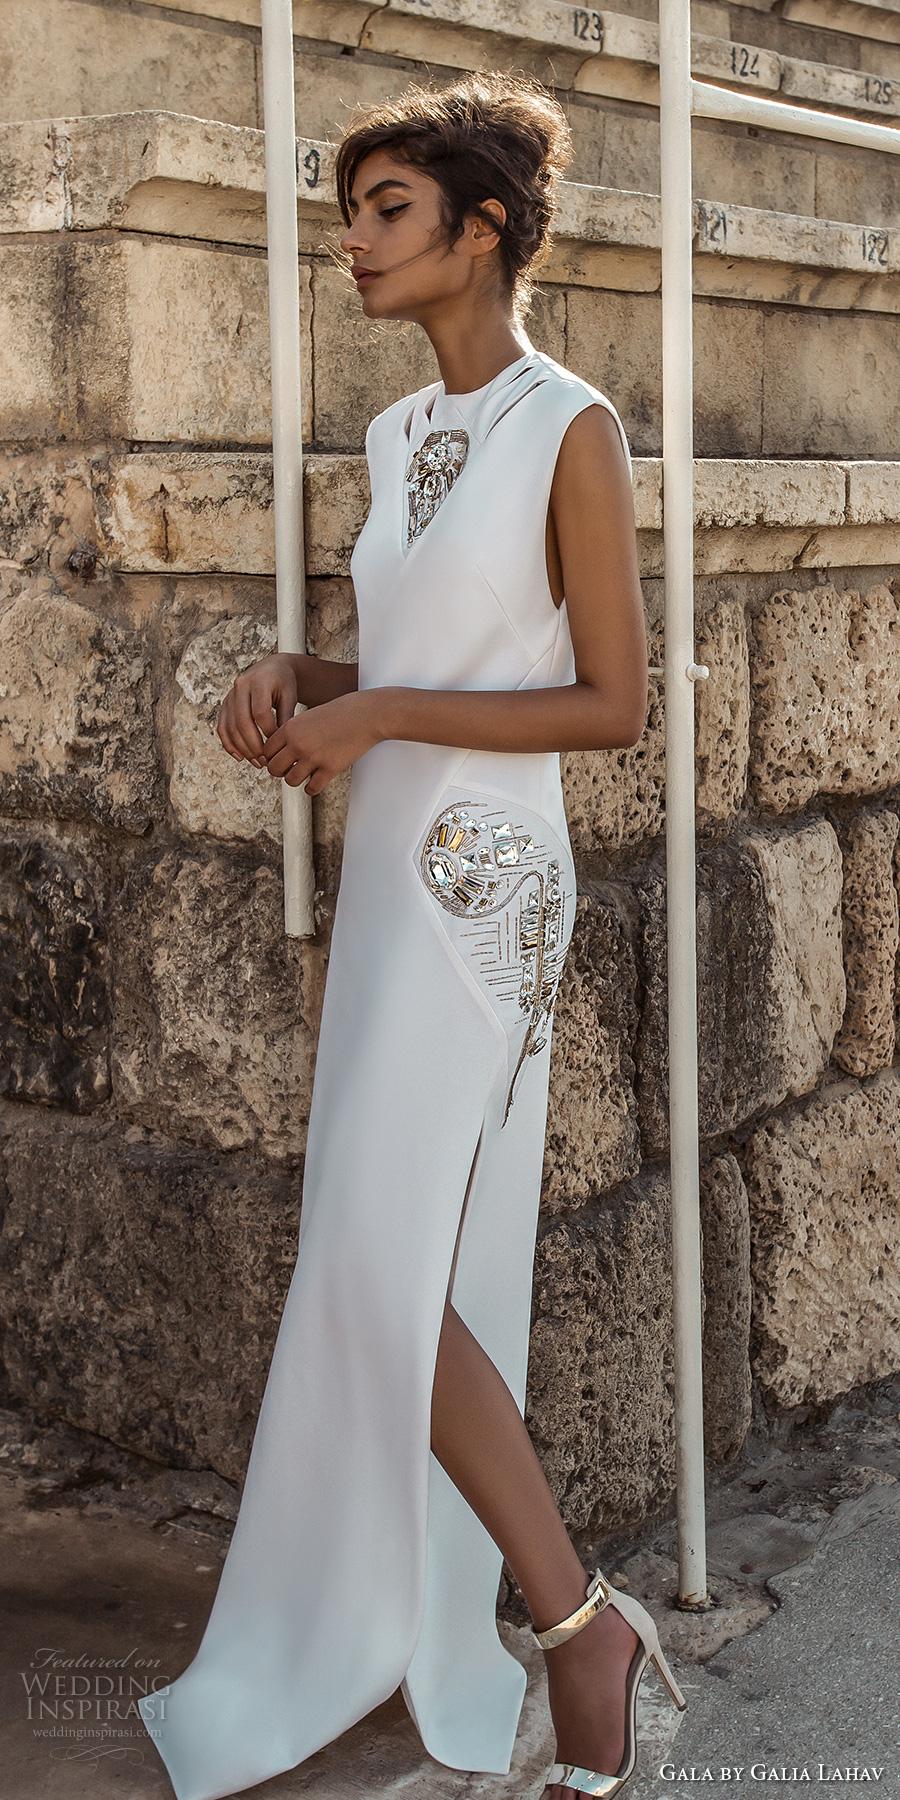 galia lahav gala 2017 bridal sleeveless high jewel neck simple light embellishment high side slit skirt elegant sheath wedding dress (812) mv